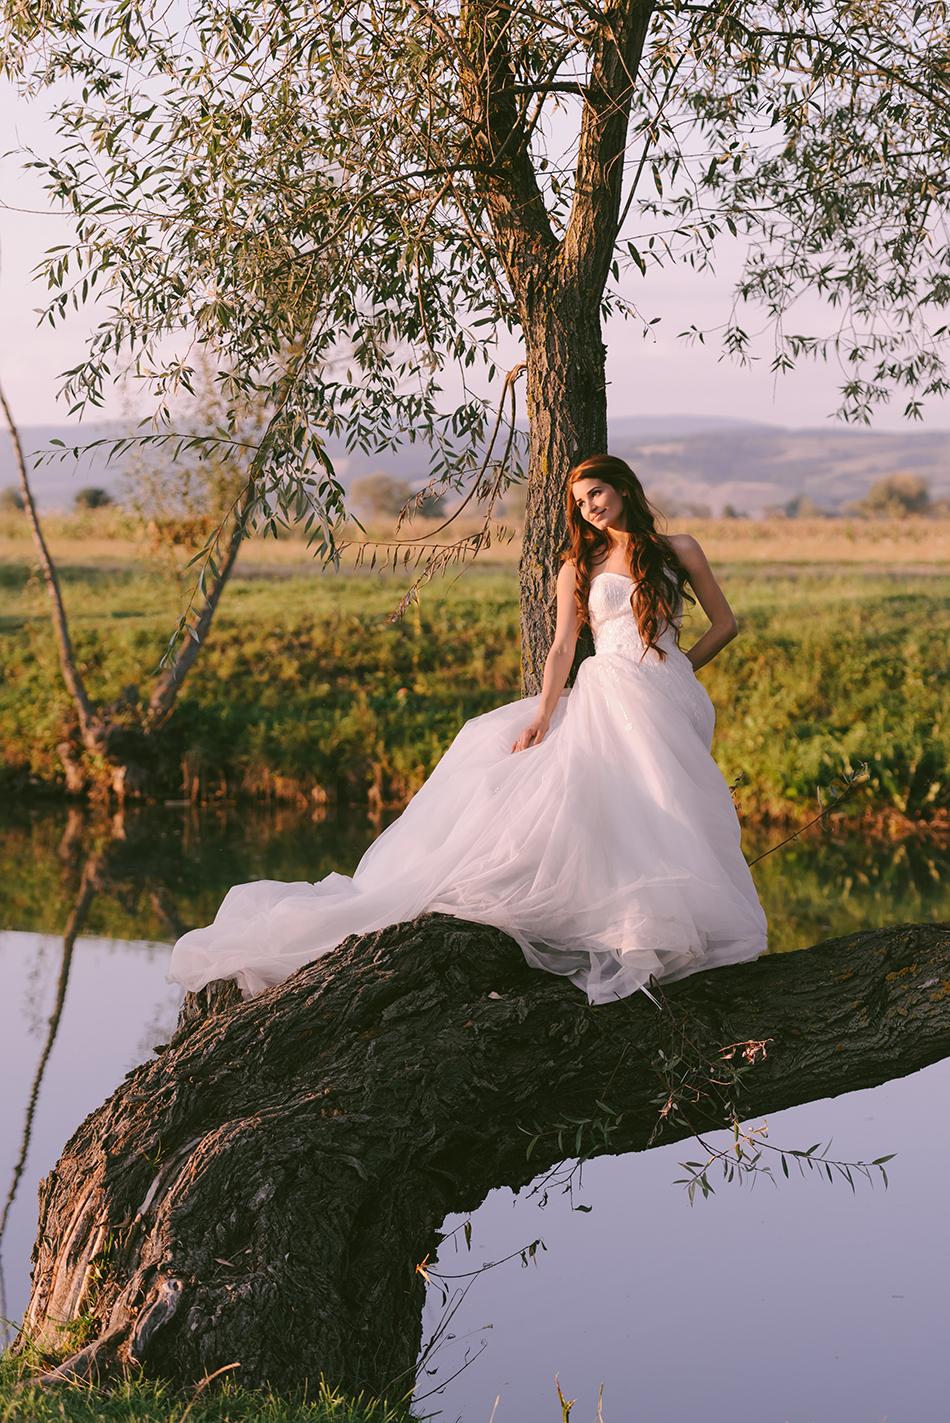 AD Passion Photography | fotograf-nunta-brasov-poiana-brasov-fotograf-profesionist_lorena-cristi_ttd_0075 | Adelin, Dida, fotograf profesionist, fotograf de nunta, fotografie de nunta, fotograf Timisoara, fotograf Craiova, fotograf Bucuresti, fotograf Arad, nunta Timisoara, nunta Arad, nunta Bucuresti, nunta Craiova